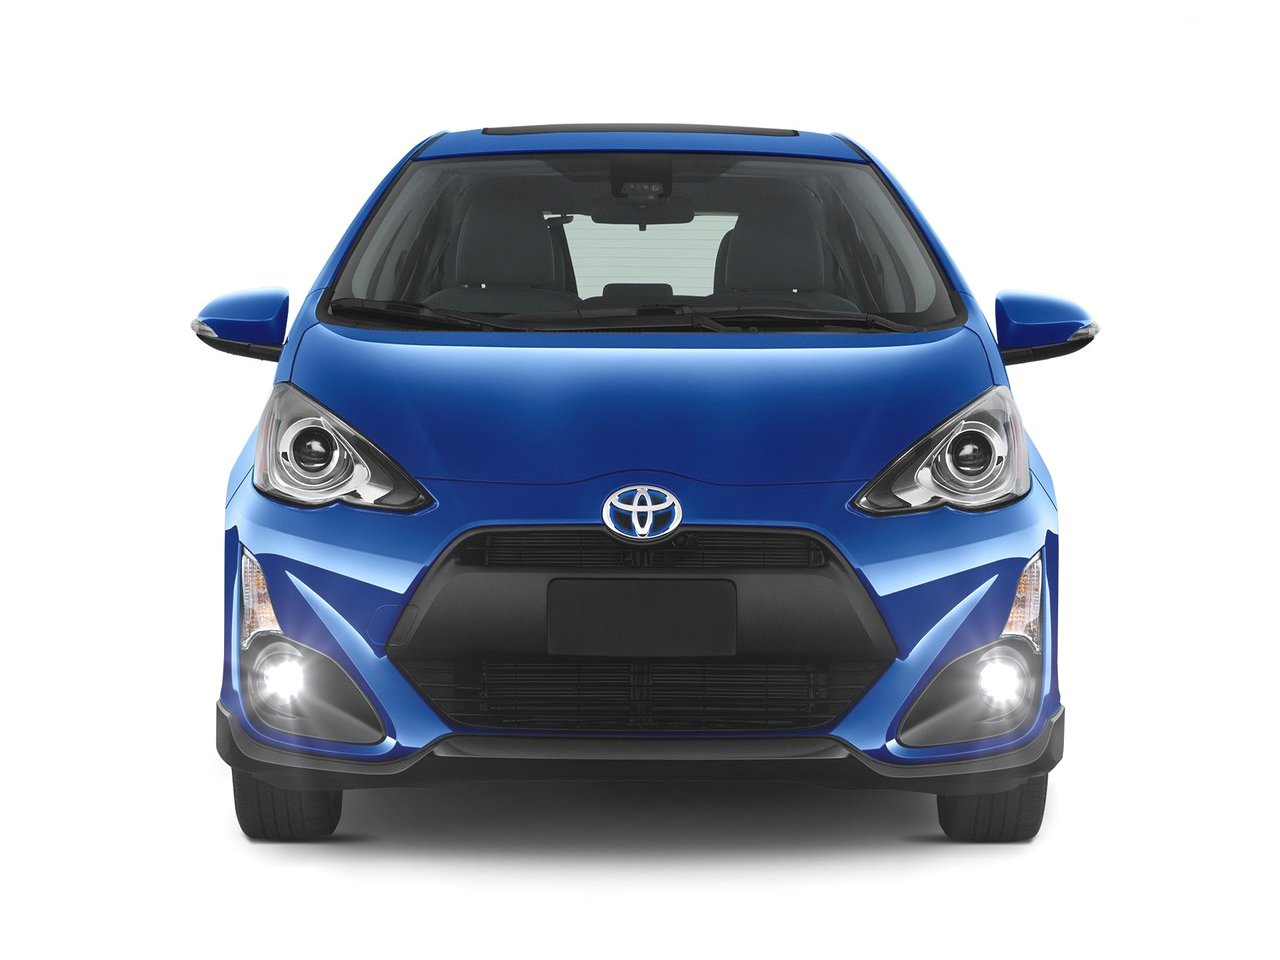 2017 2018 Toyota Prius c Xenon Fog Lights Lamps Kit